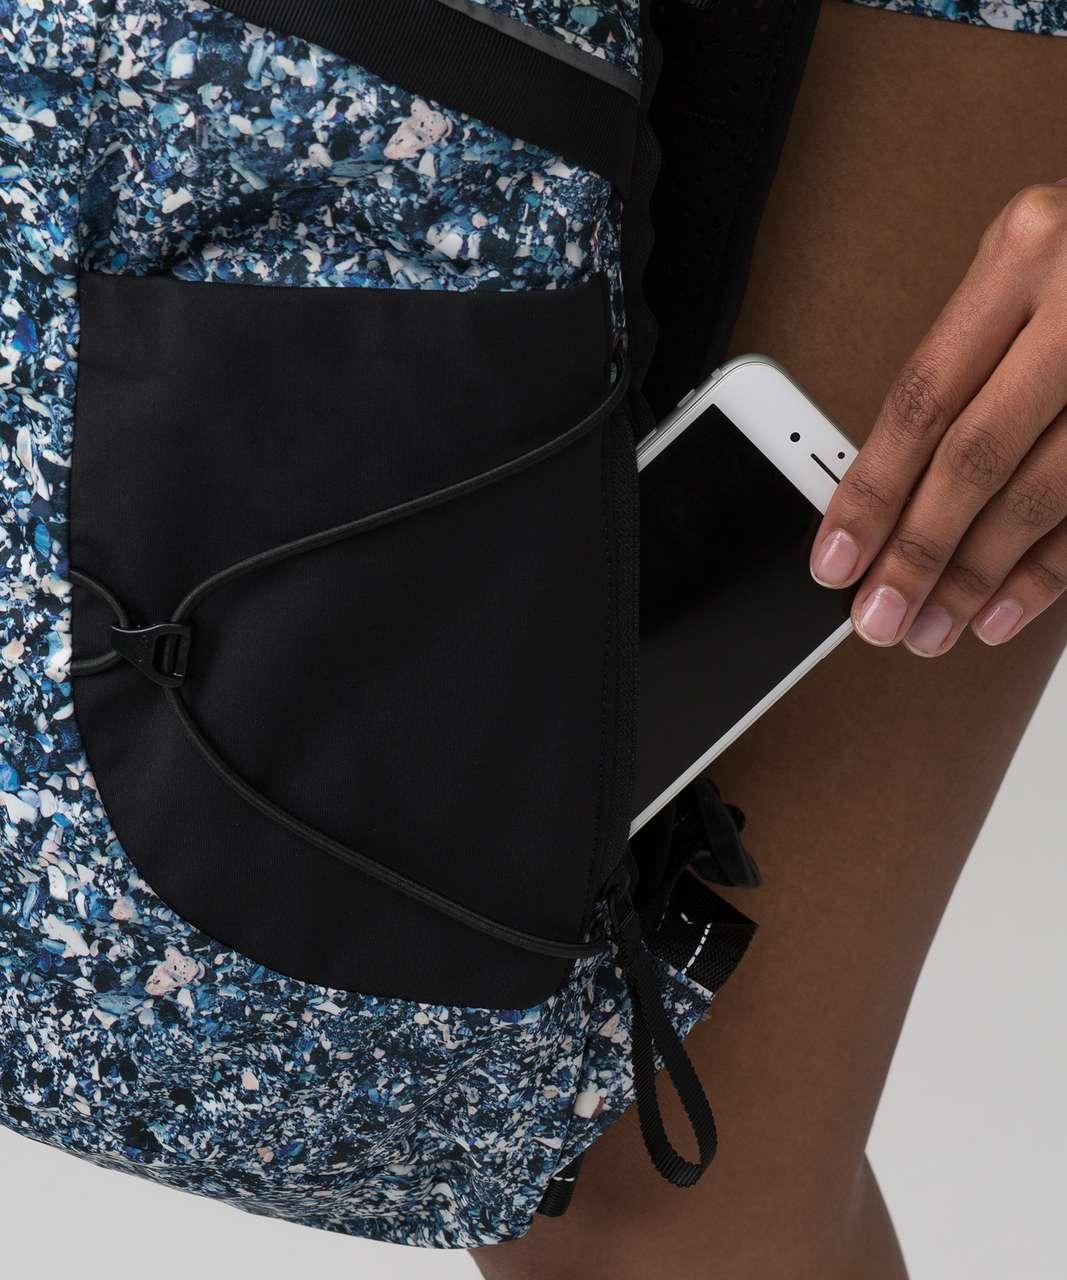 Lululemon Run All Day Backpack II (SeaWheeze) - Tofino Shells Multi Black